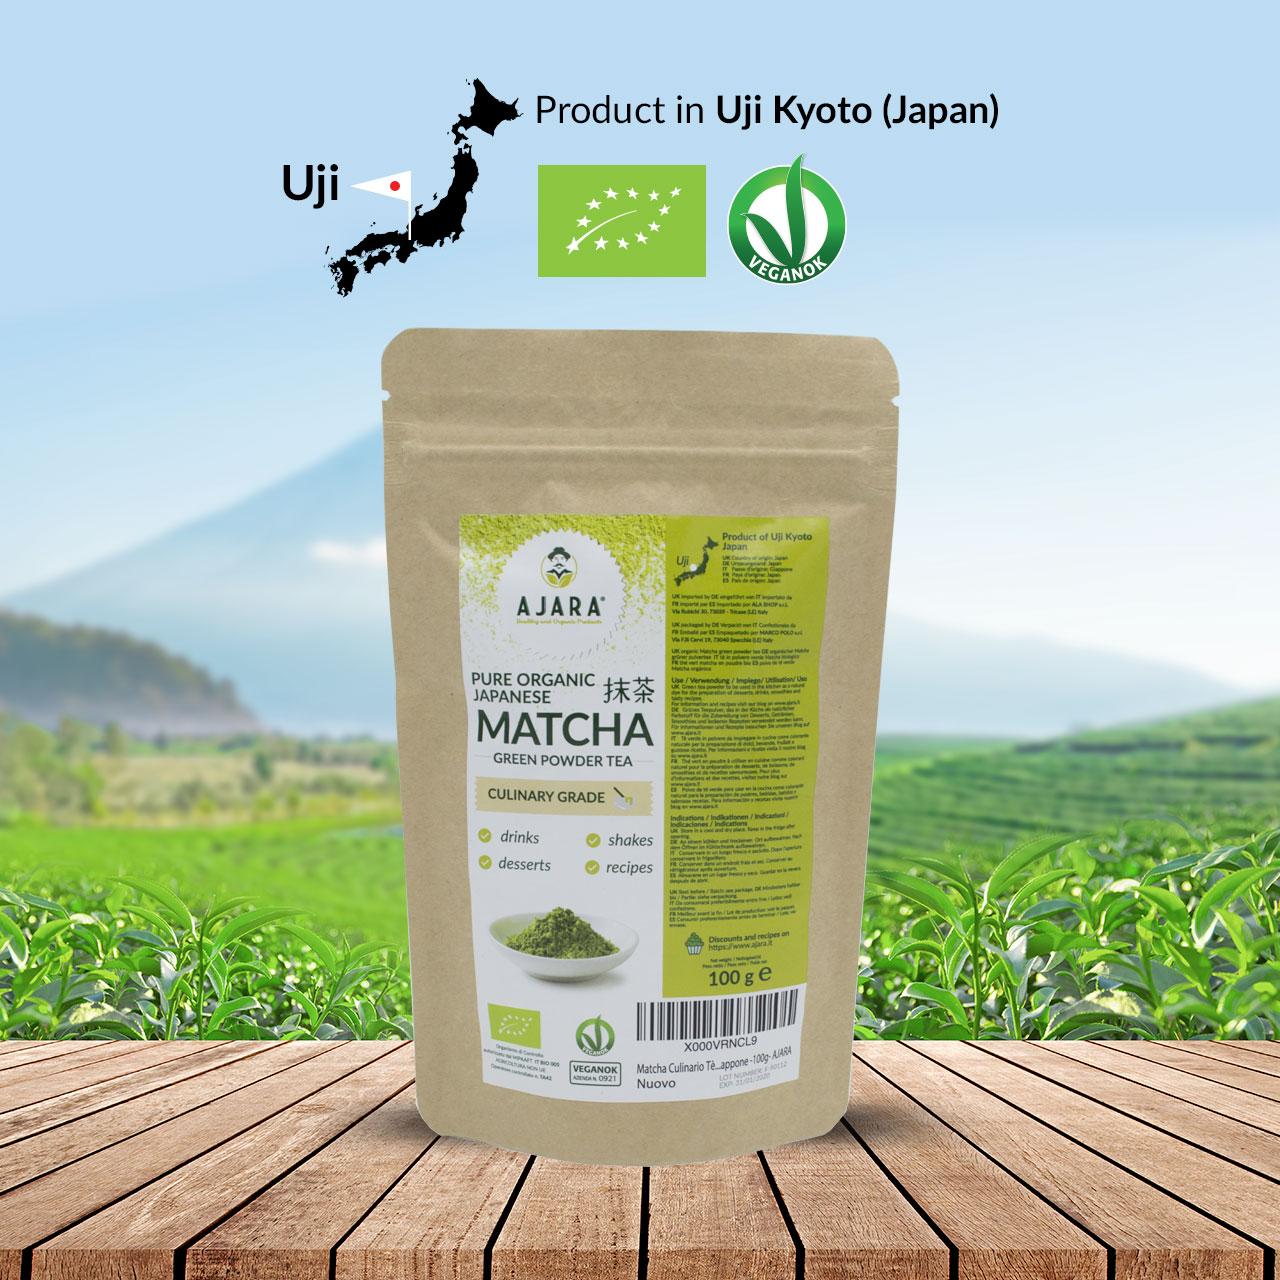 Tè verde Matcha giapponese grado culinario